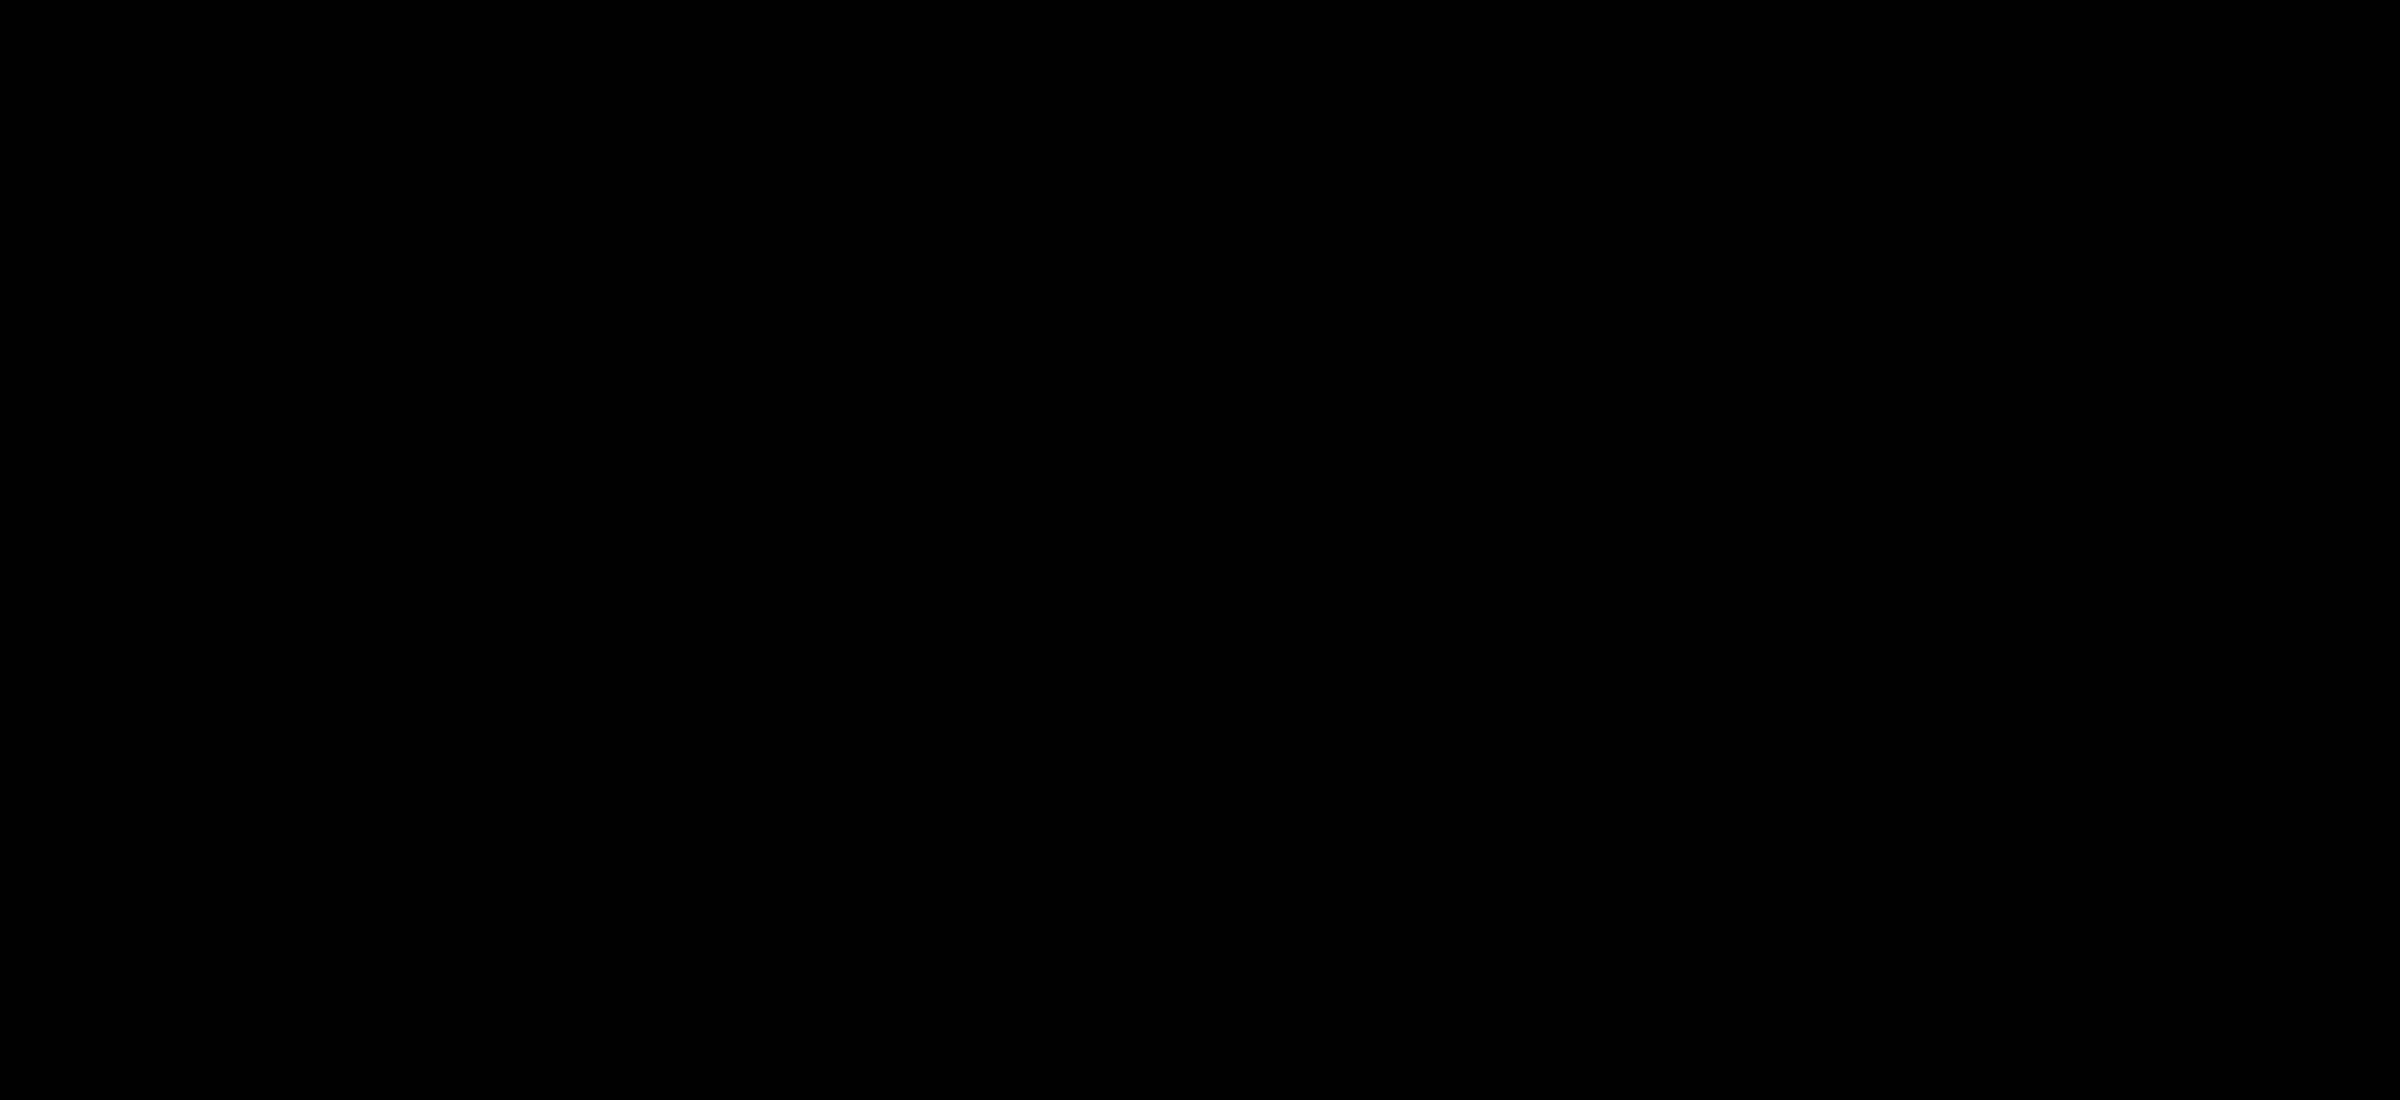 Chinook Salmon Vector Art Image